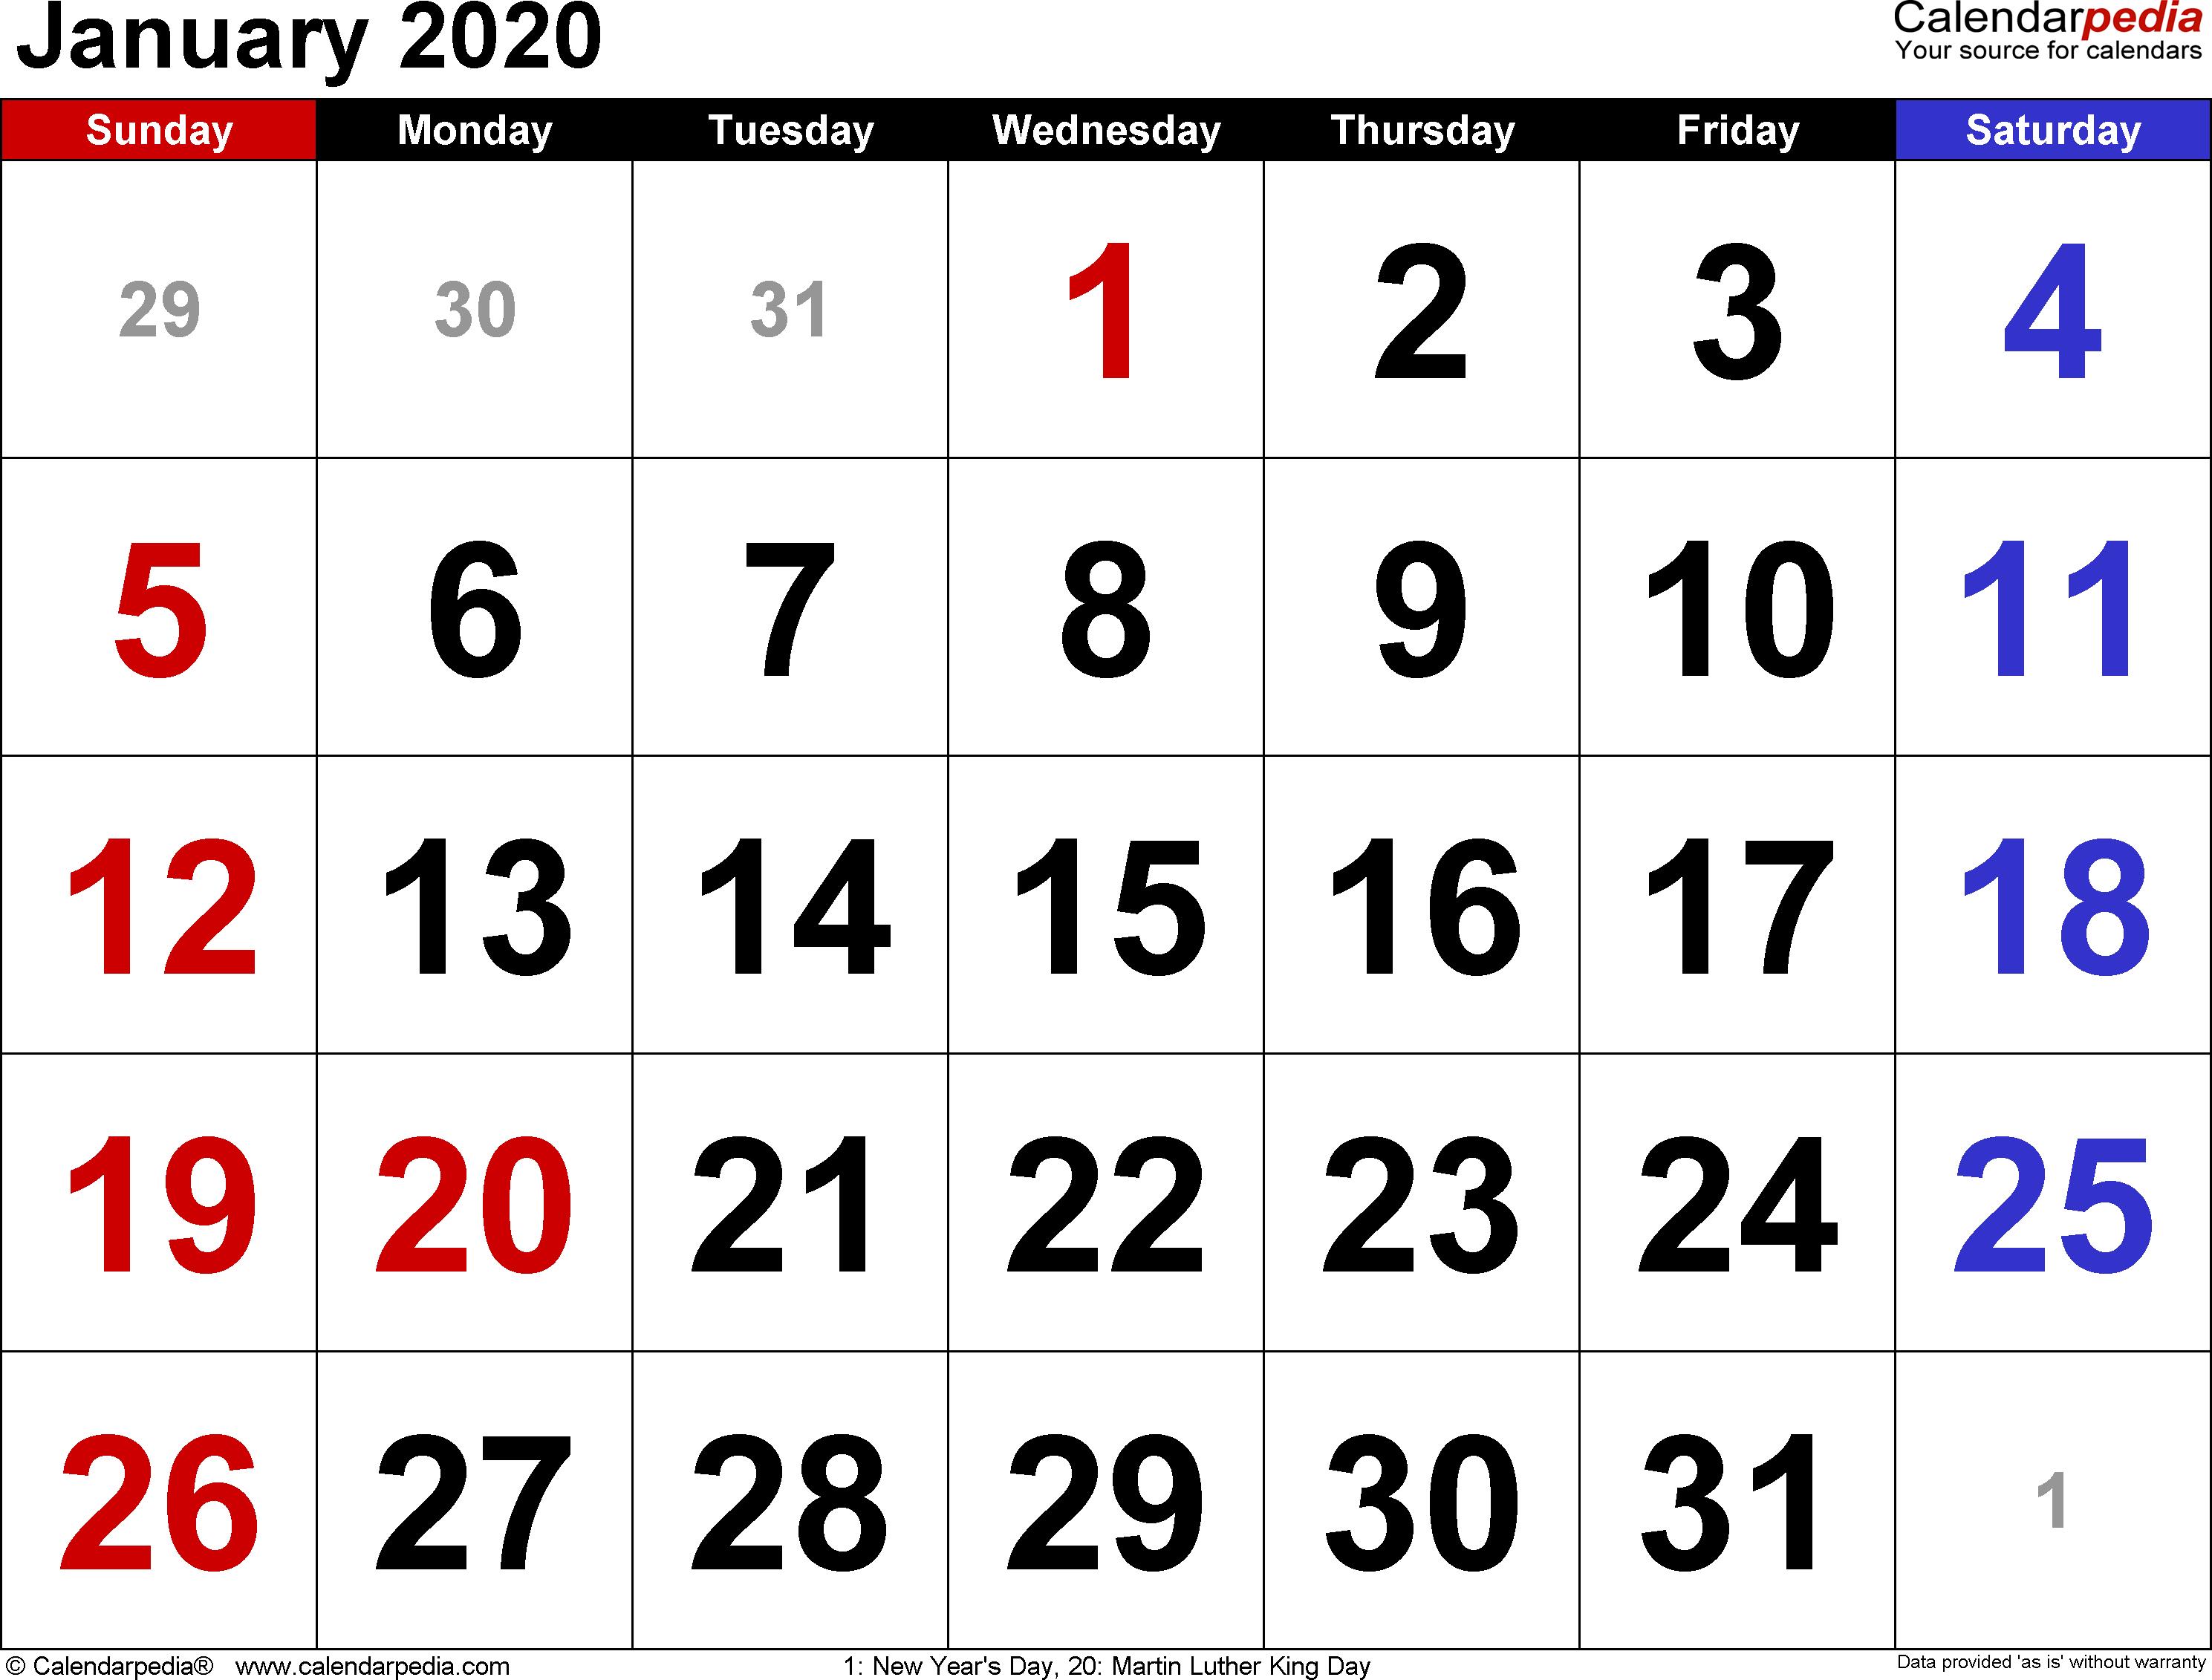 January 2020 Calendar Wallpapers - Top Free January 2020